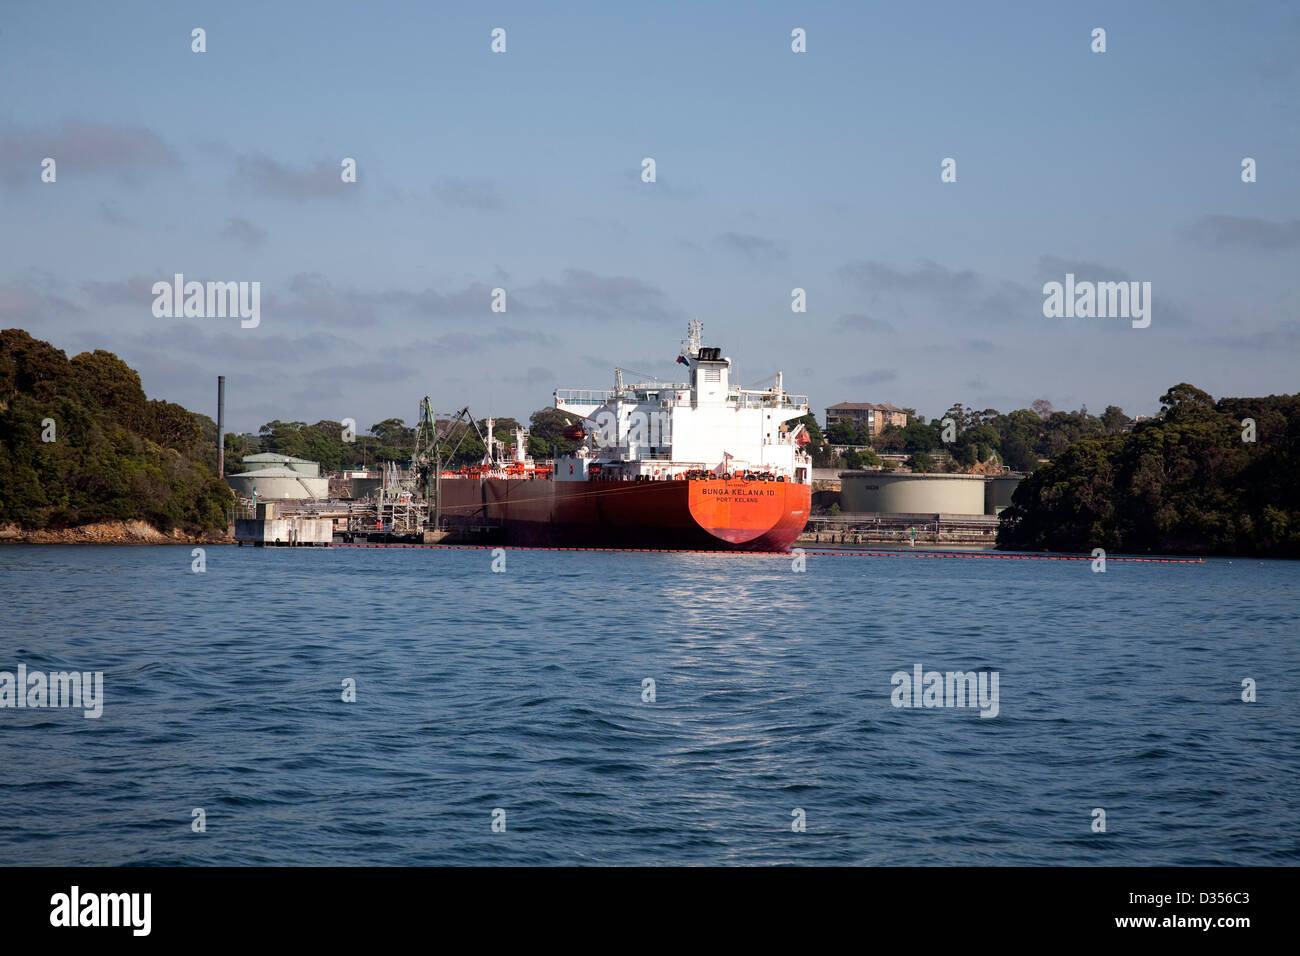 Bulk Oil Carrier Bunga Kelana at the Greenwich Shell Oil Terminal Sydney Australia - Stock Image